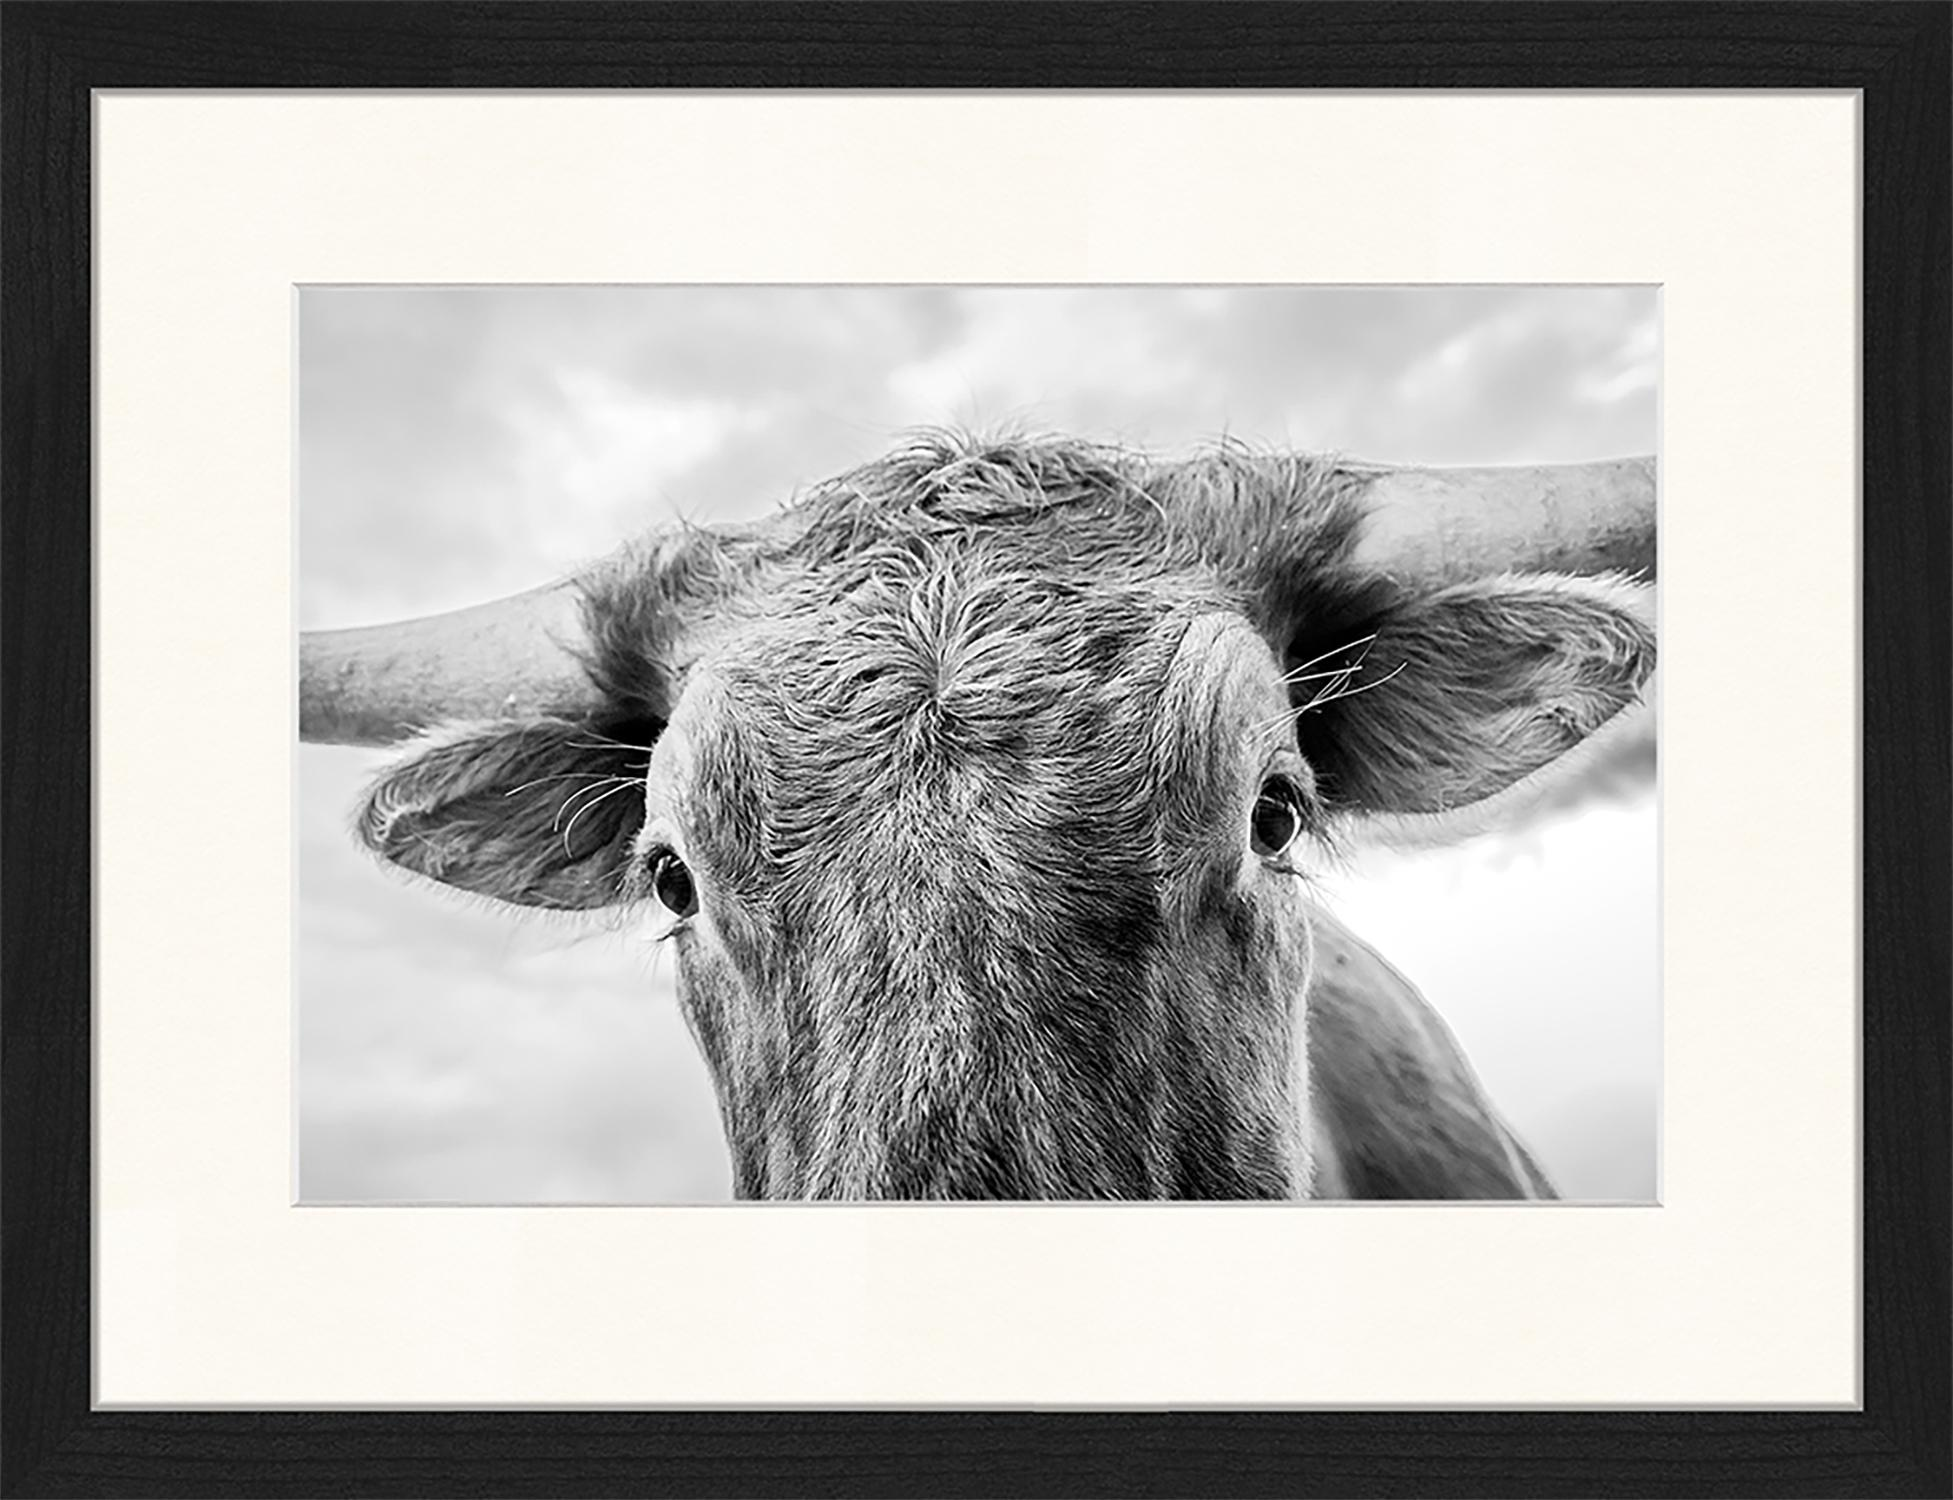 Stampa digitale incorniciata Texas Longhorn Steer In Rural Utah, Immagine: stampa digitale su carta,, Cornice: legno, verniciato, Nero, bianco, Larg. 43 x Alt. 33 cm